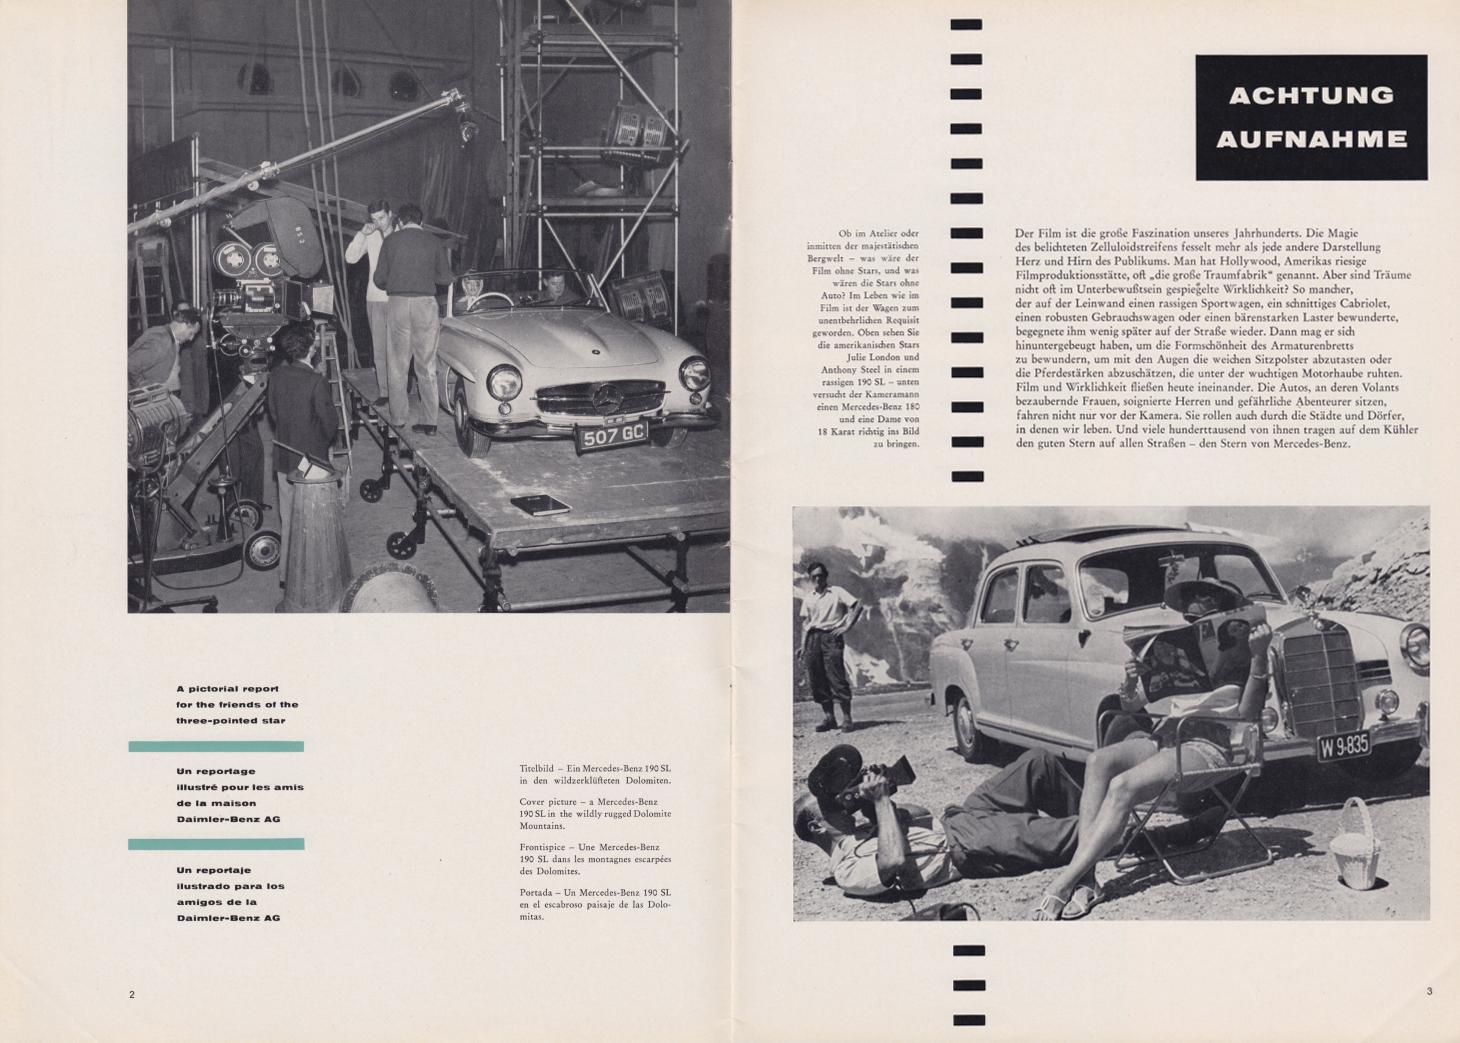 (REVISTA): Periódico In aller welt n.º 30 - Mercedes-Benz no mundo - 1959 - multilingue 002